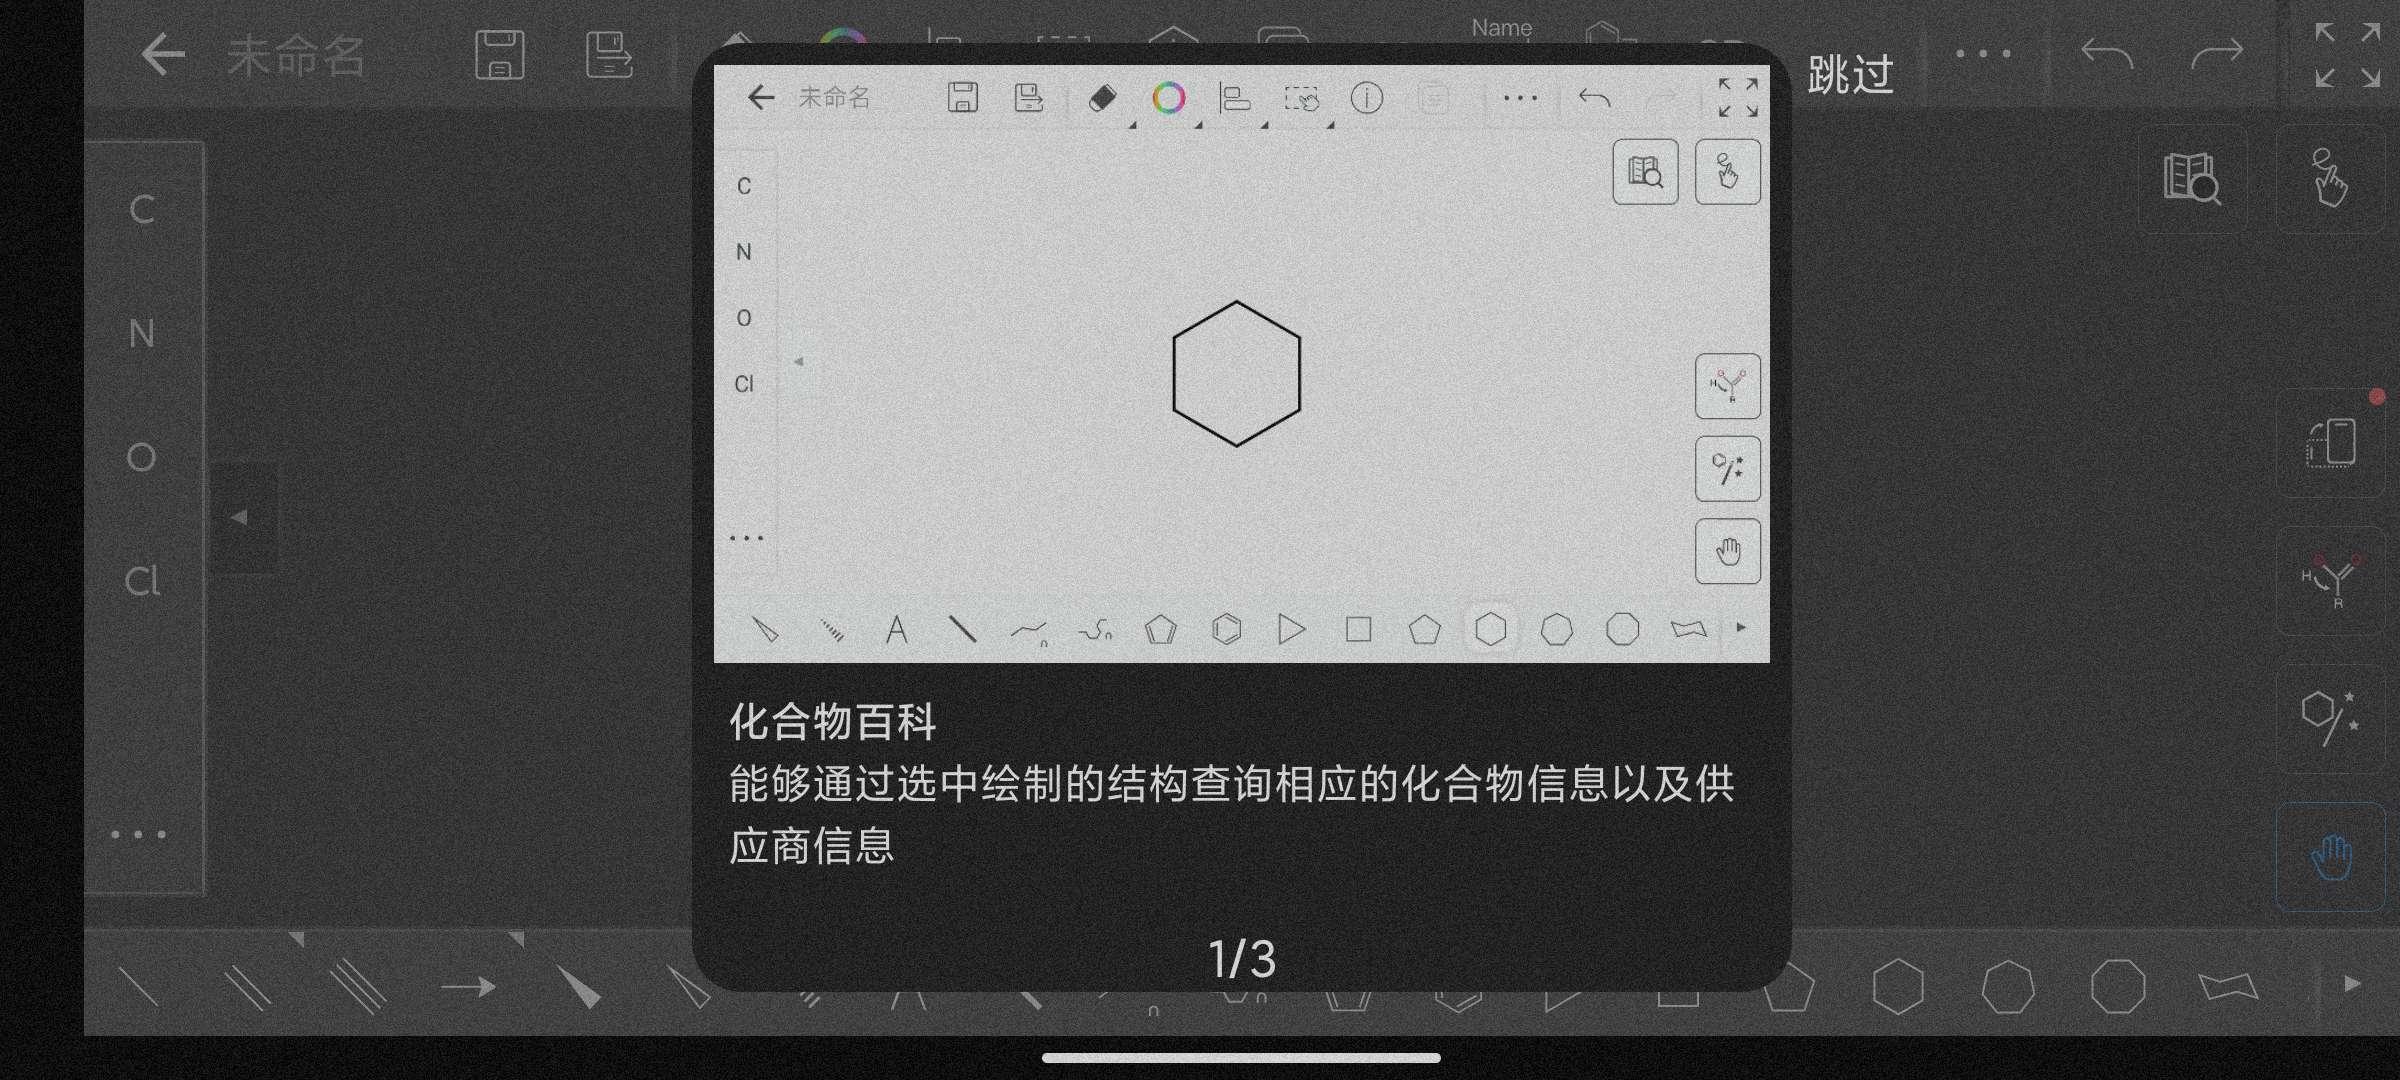 KingDraw 化学结构式编辑器v2.5.0